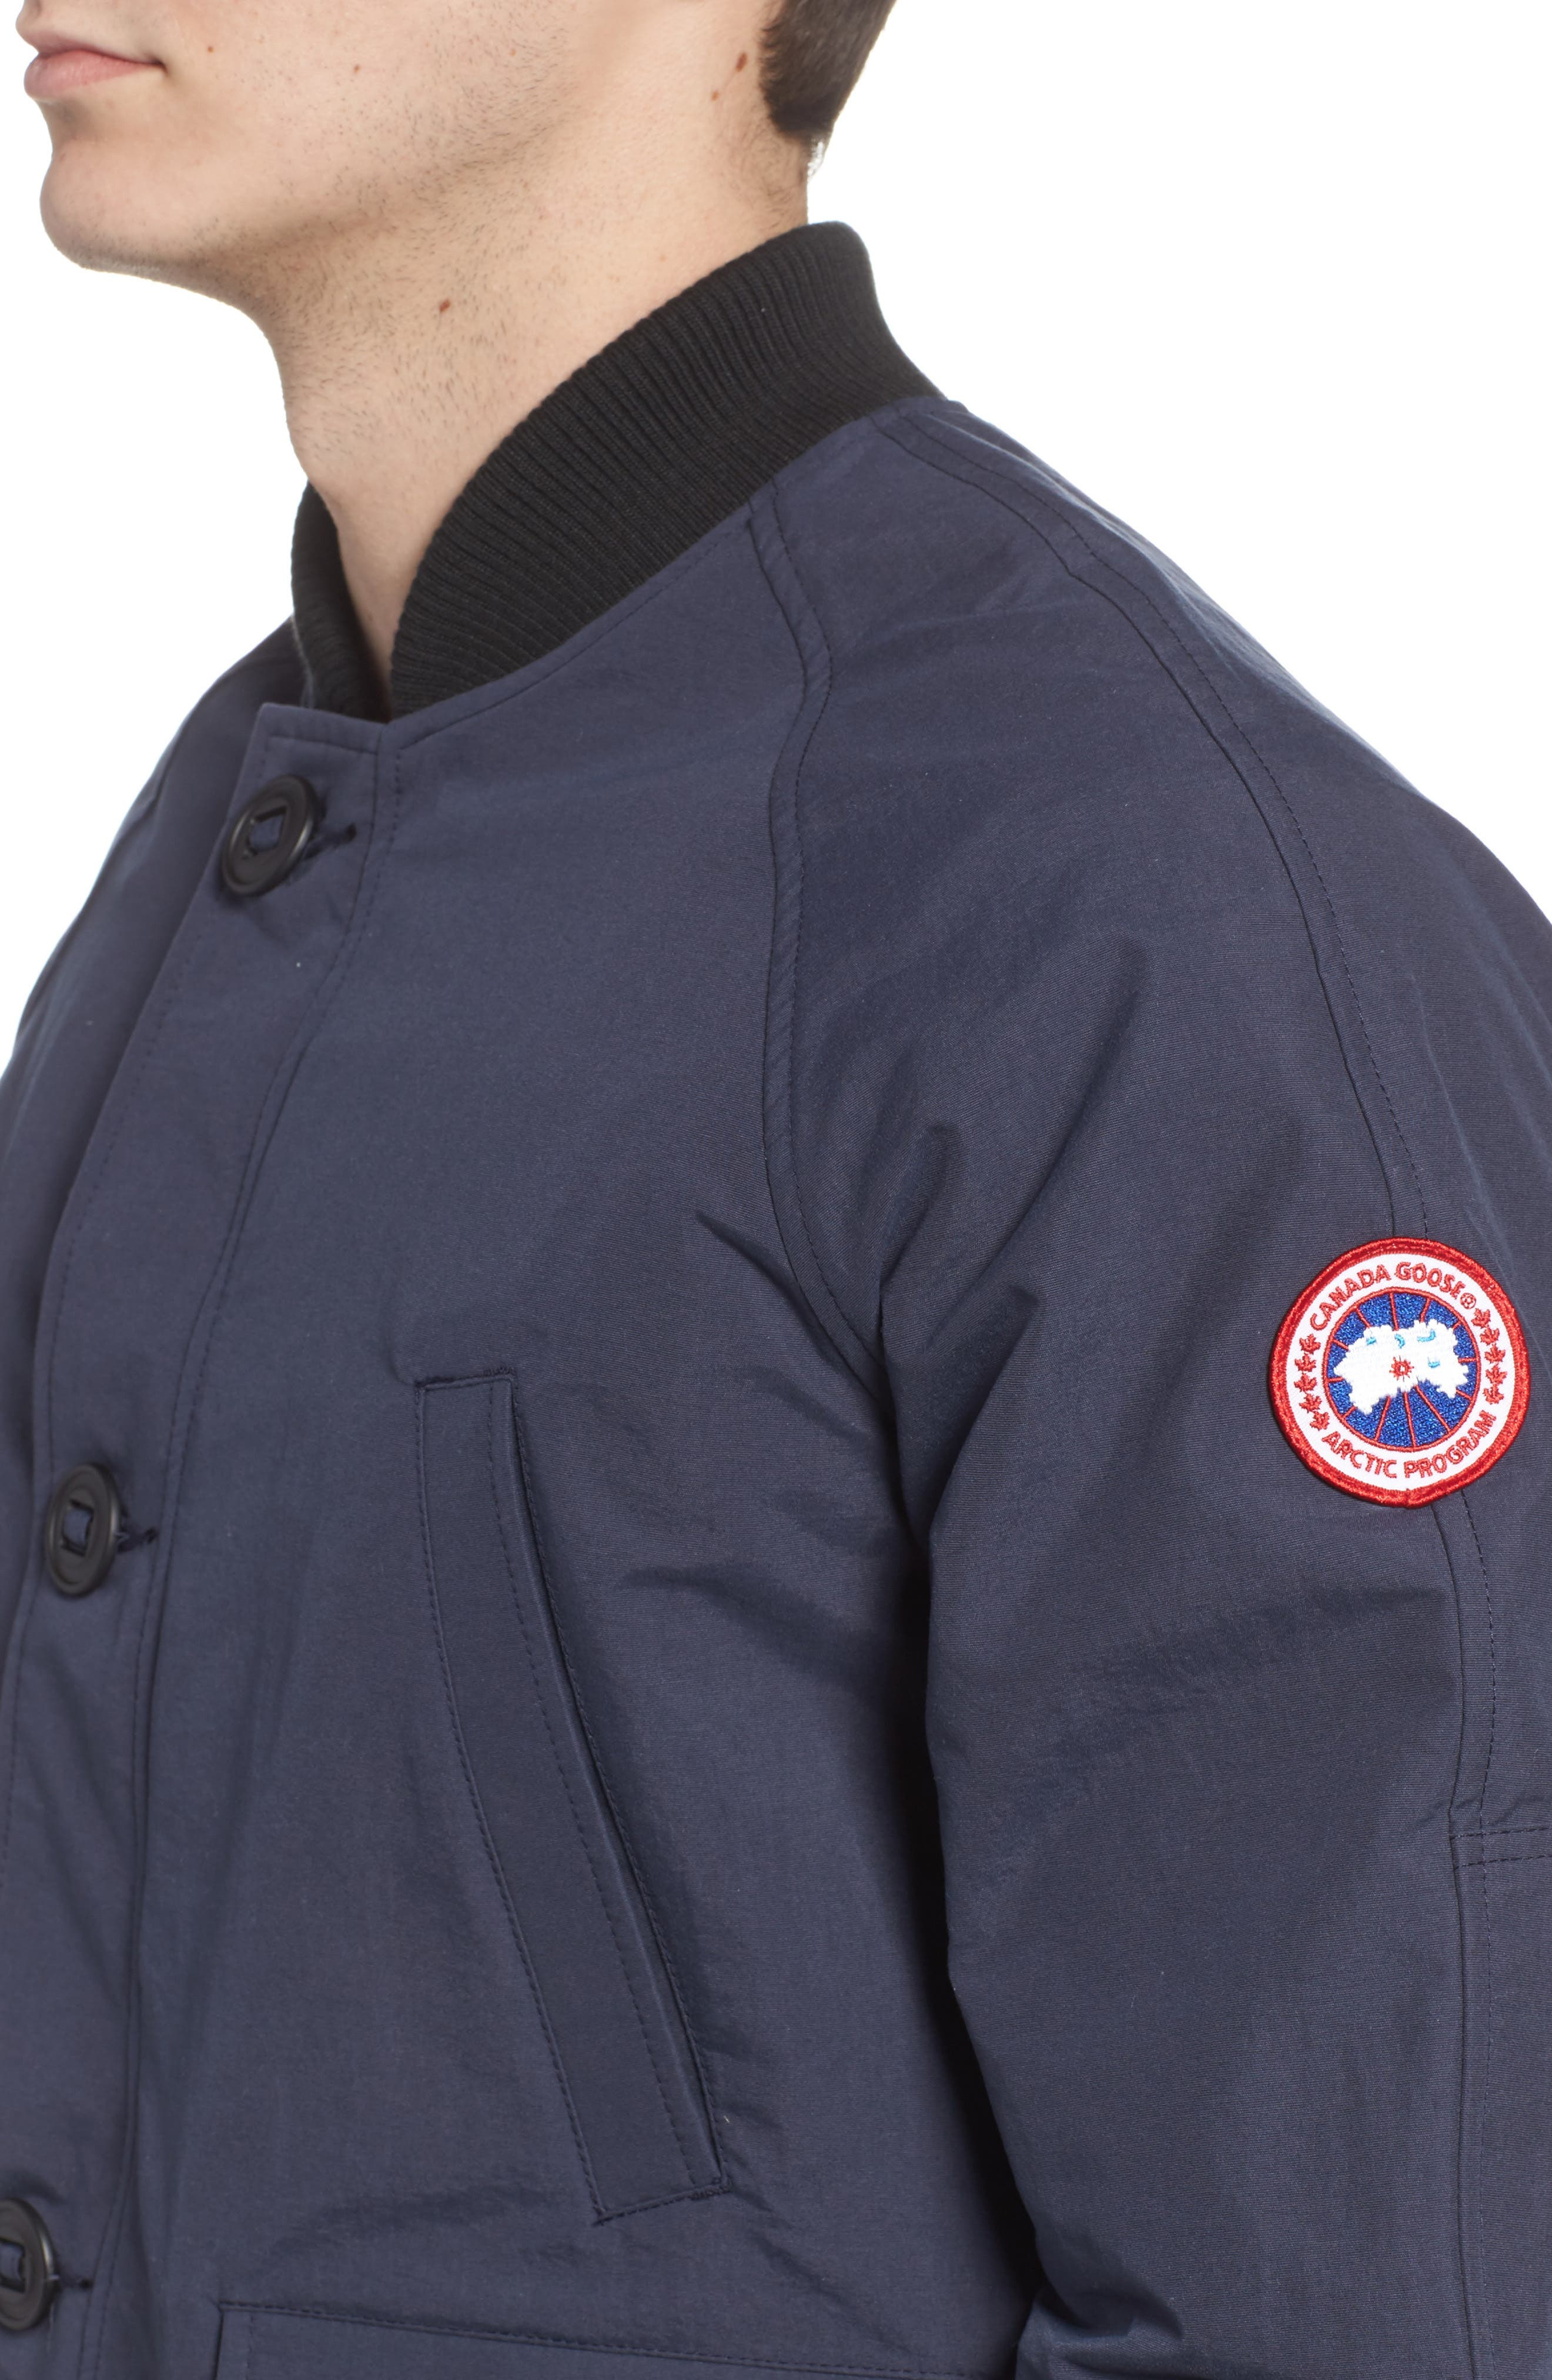 Faber Slim Fit Bomber Jacket,                             Alternate thumbnail 4, color,                             400